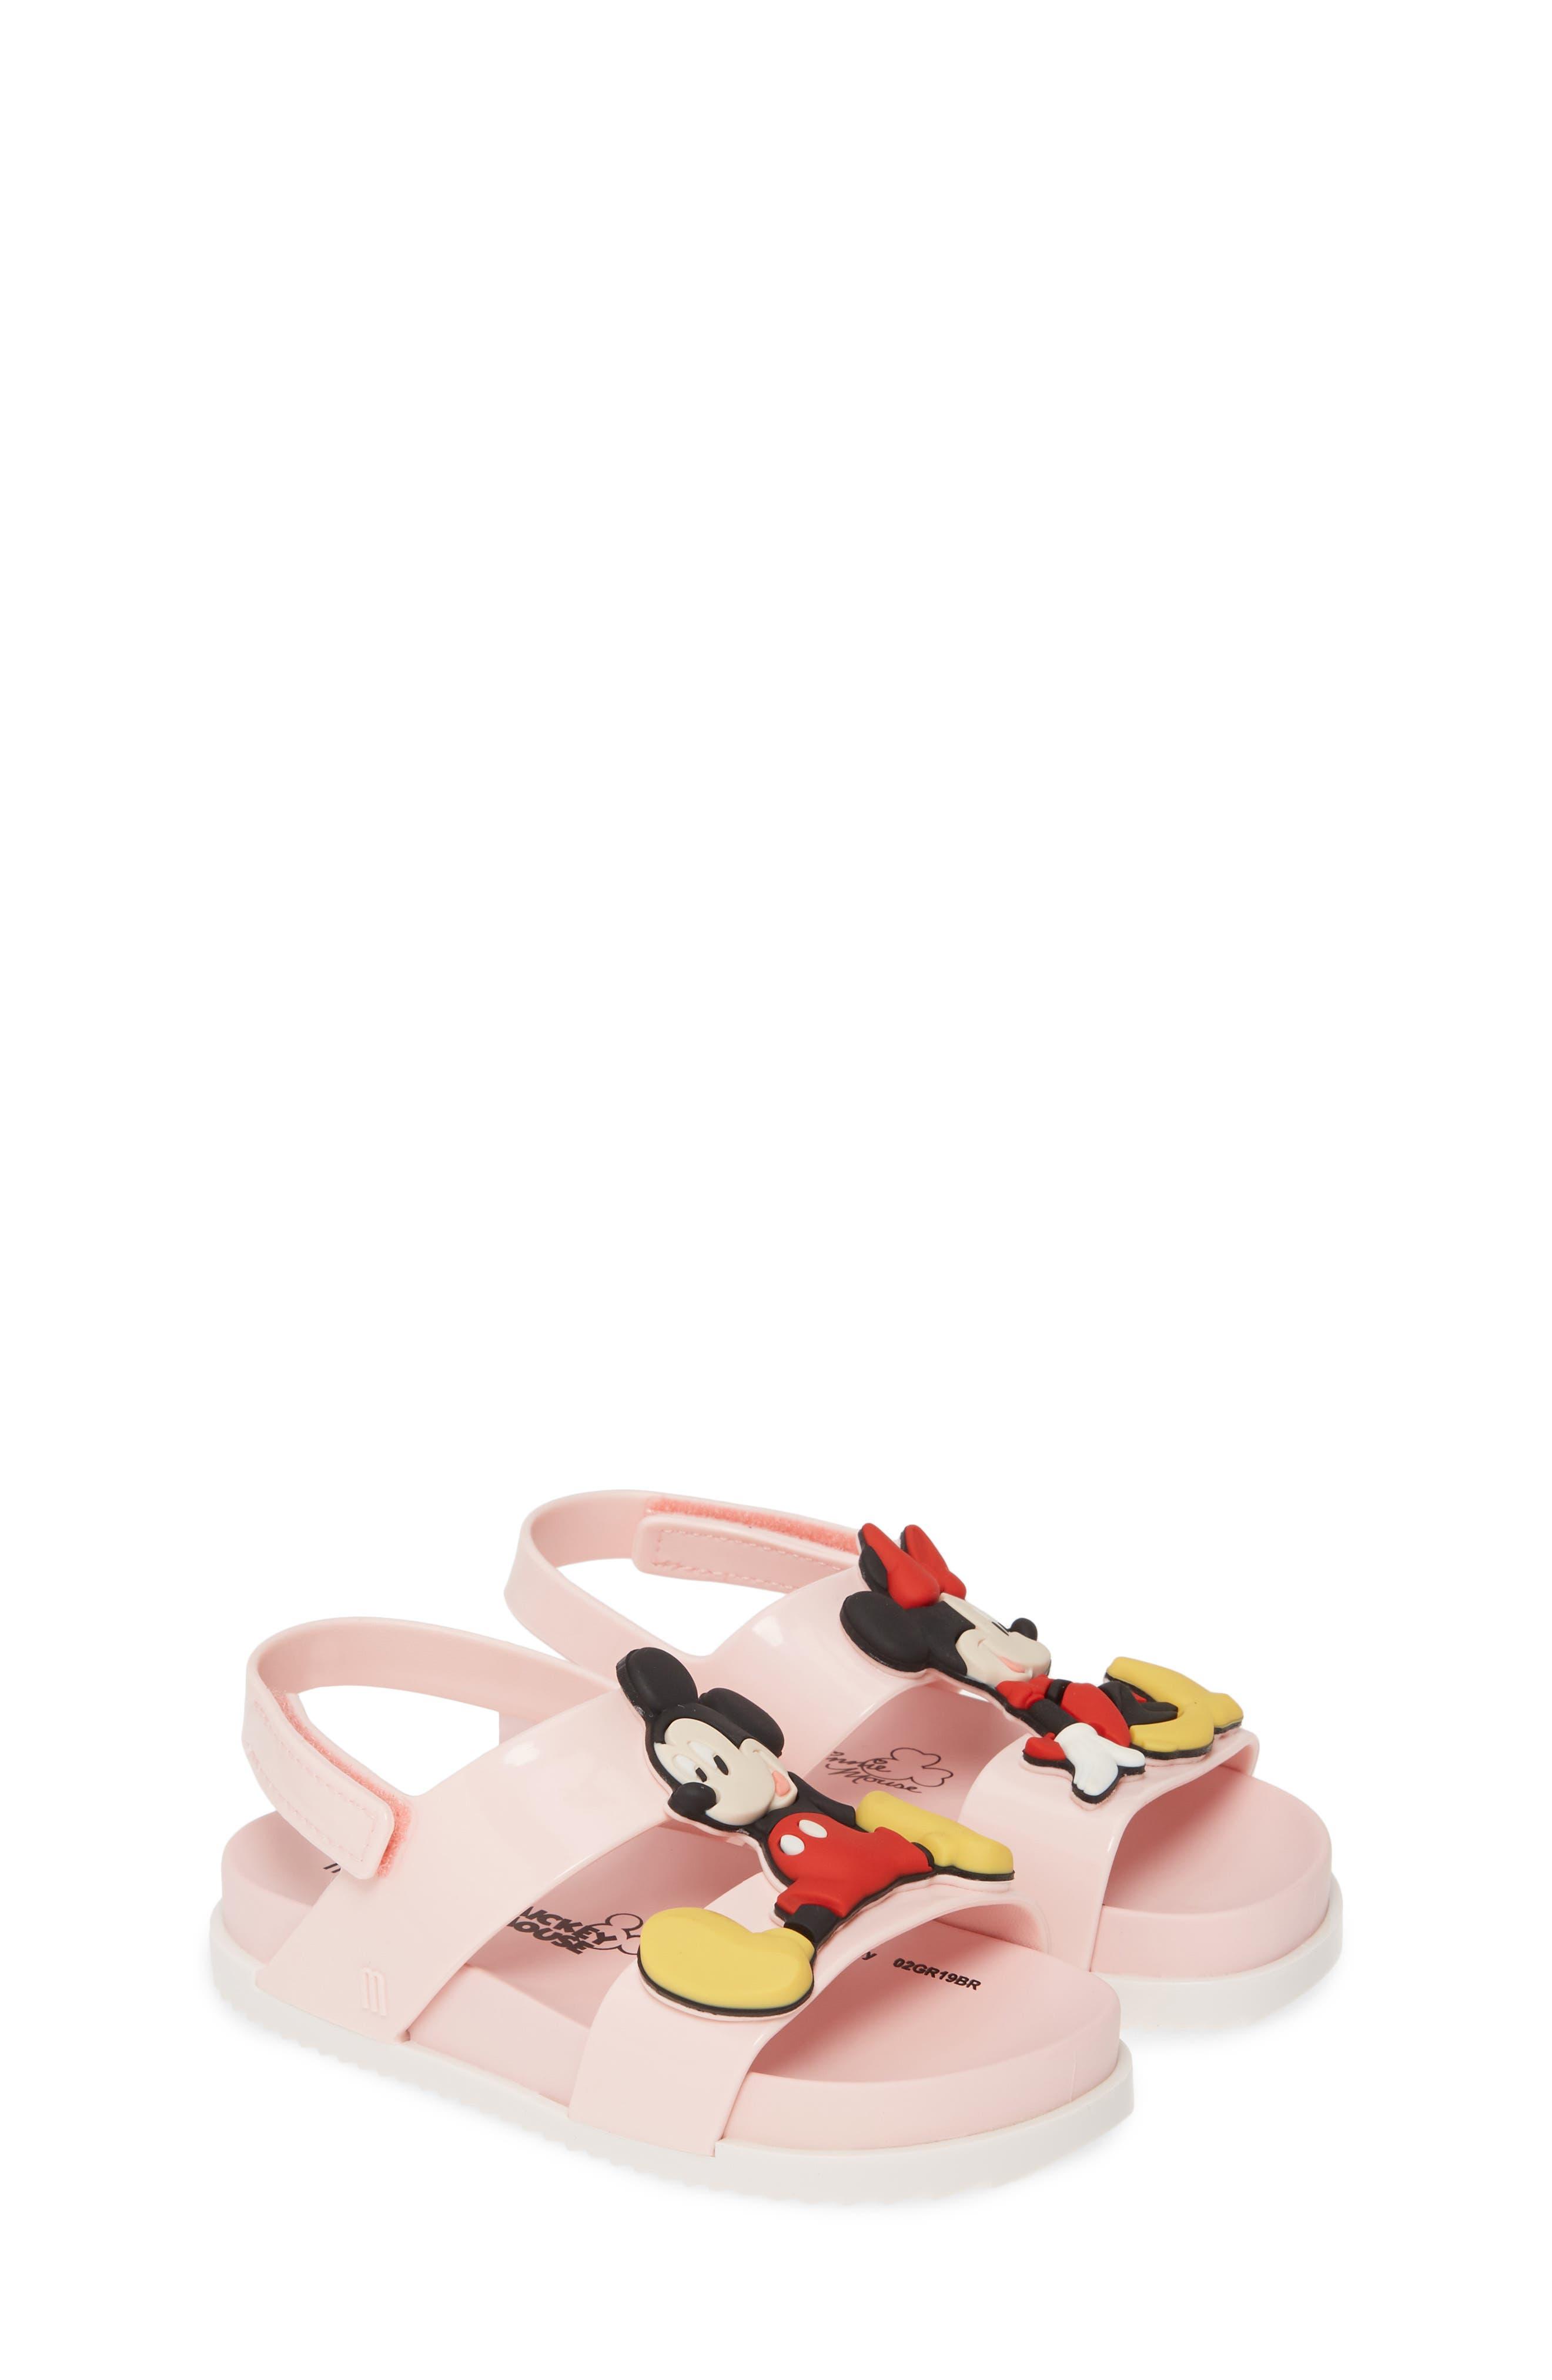 Toddler Girls Mini Melissa X Disney Cosmic Sandal Size 9 M  Pink